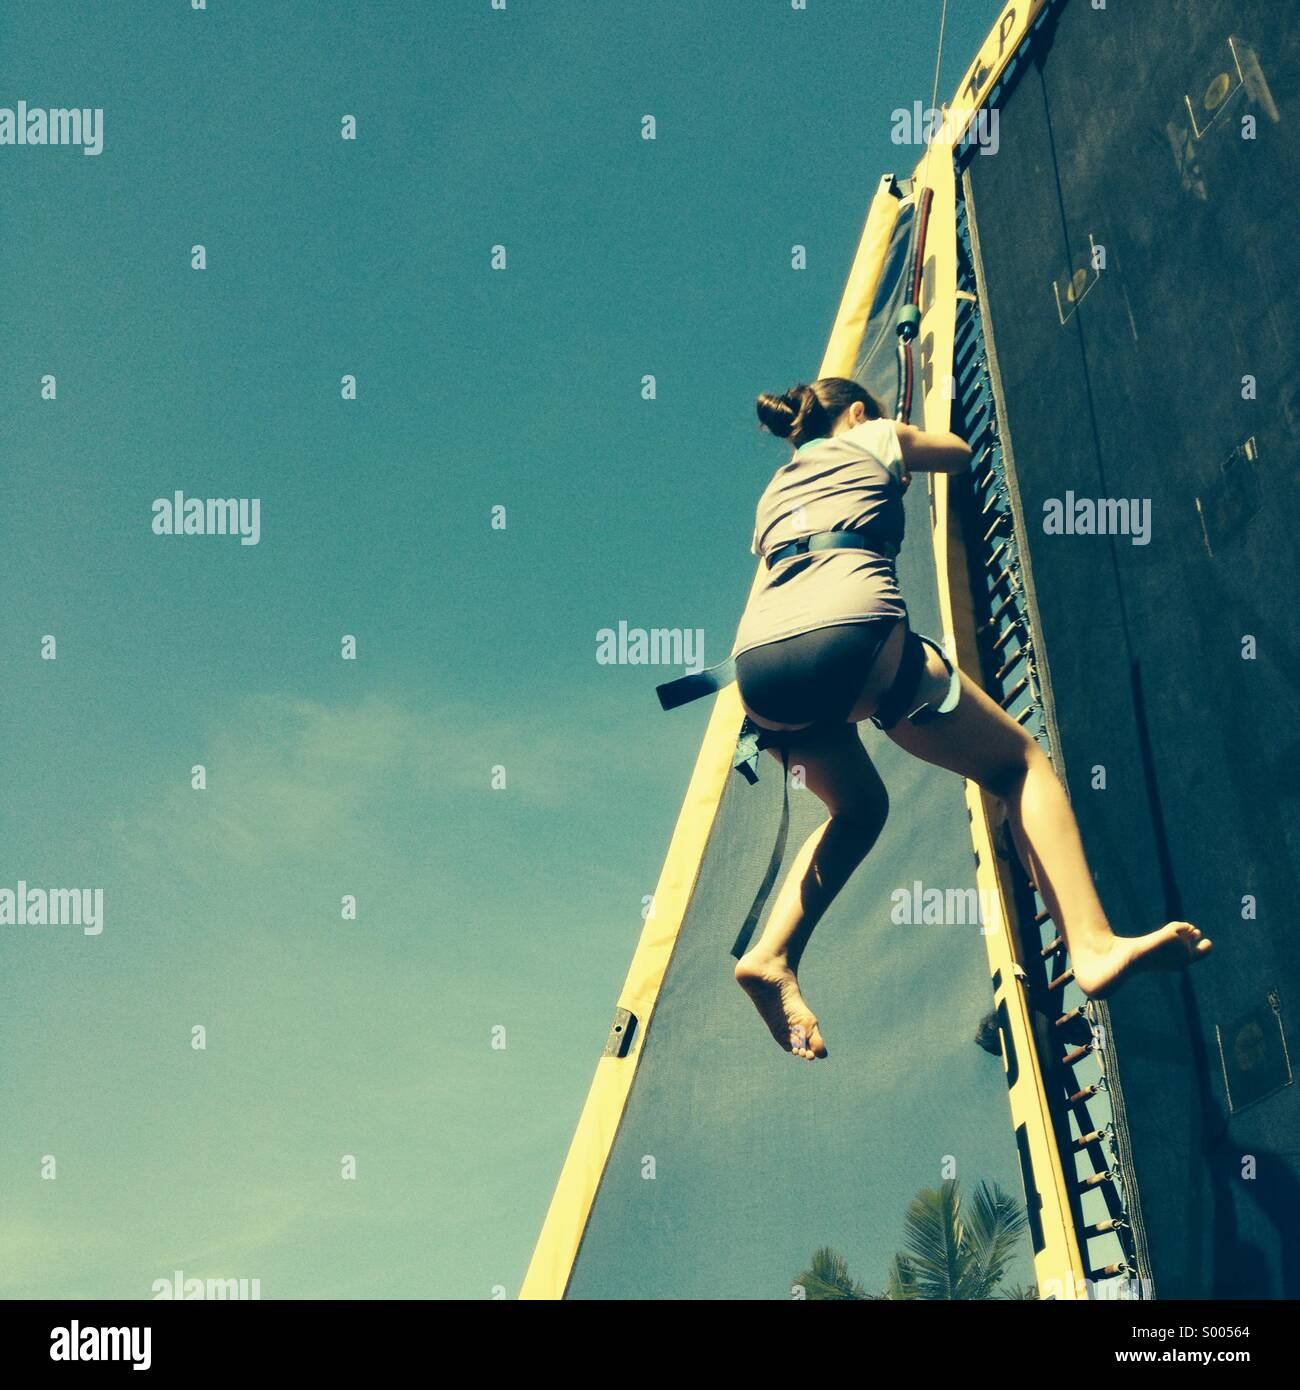 Girl climbing on an abseiling wall. Stock Photo